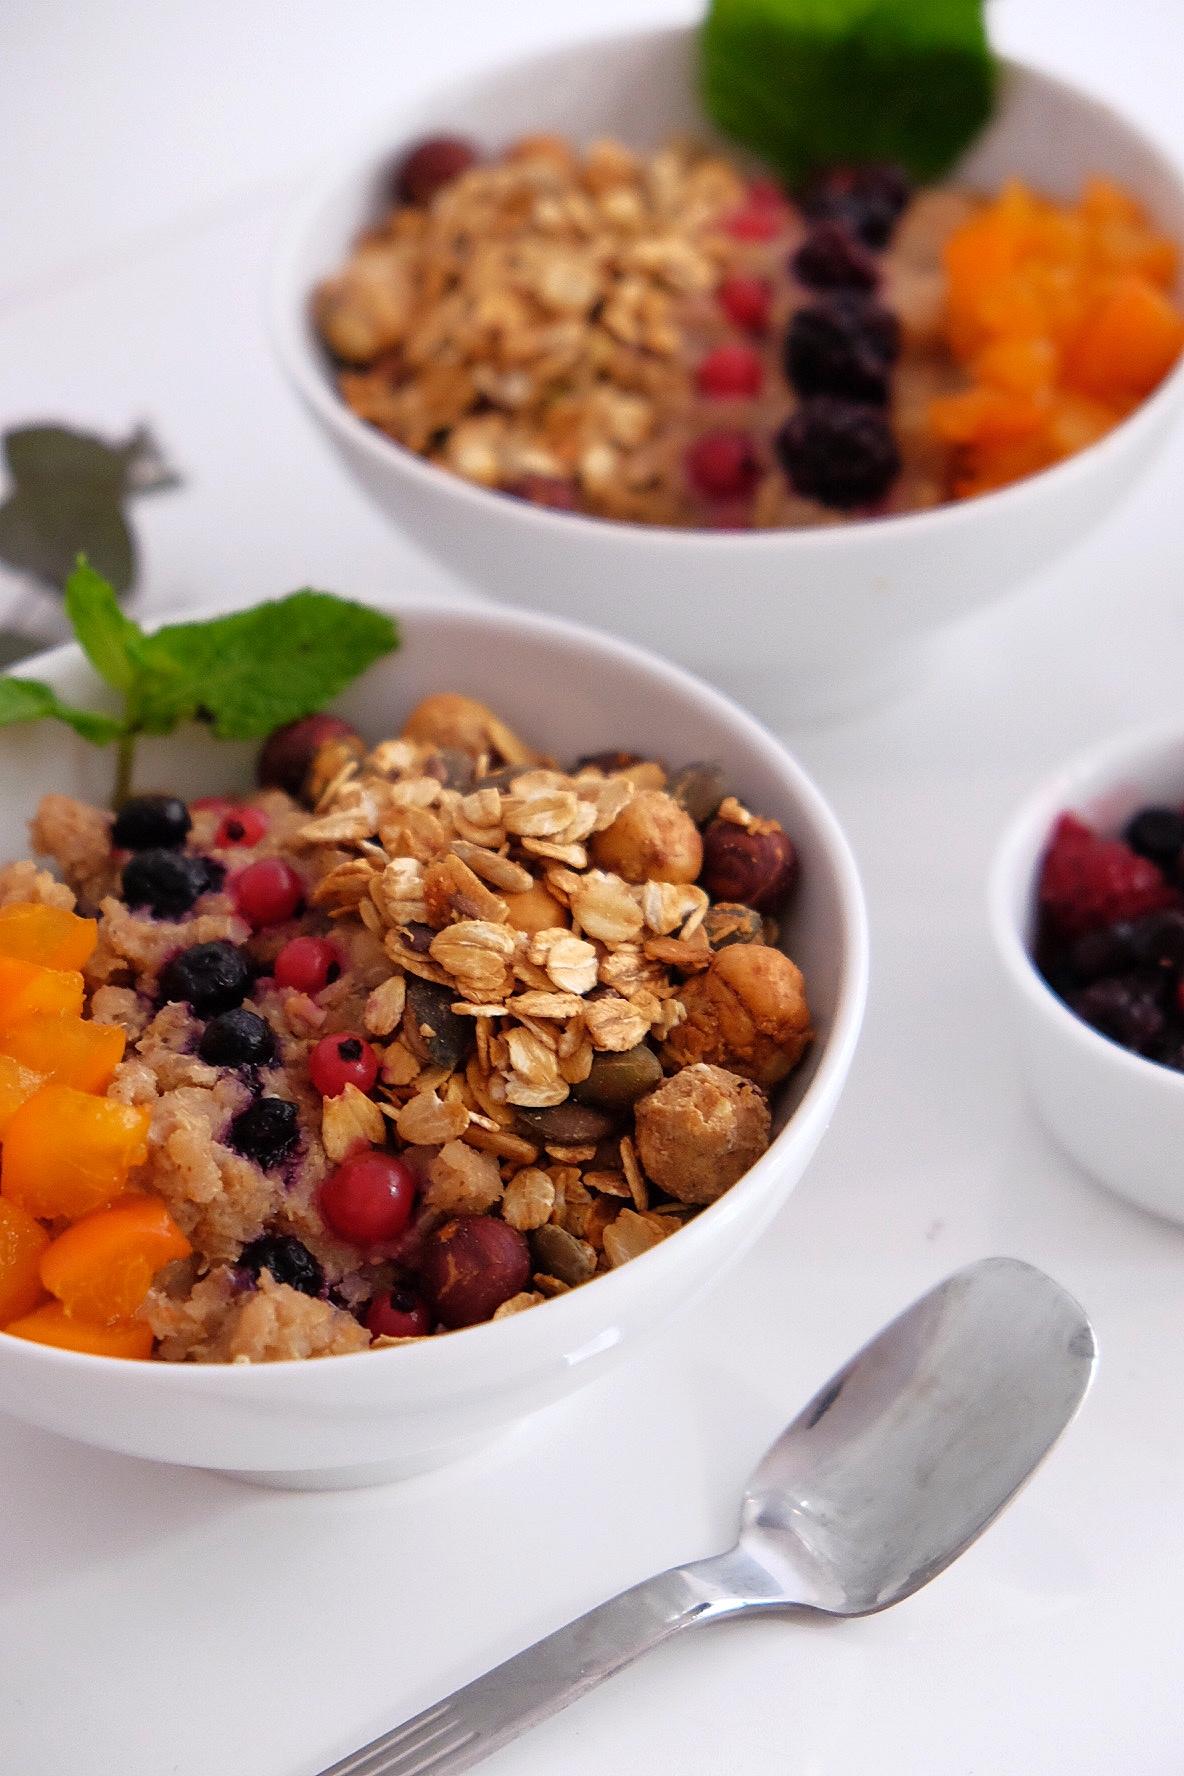 Almond quinoa porridge with cinnamon